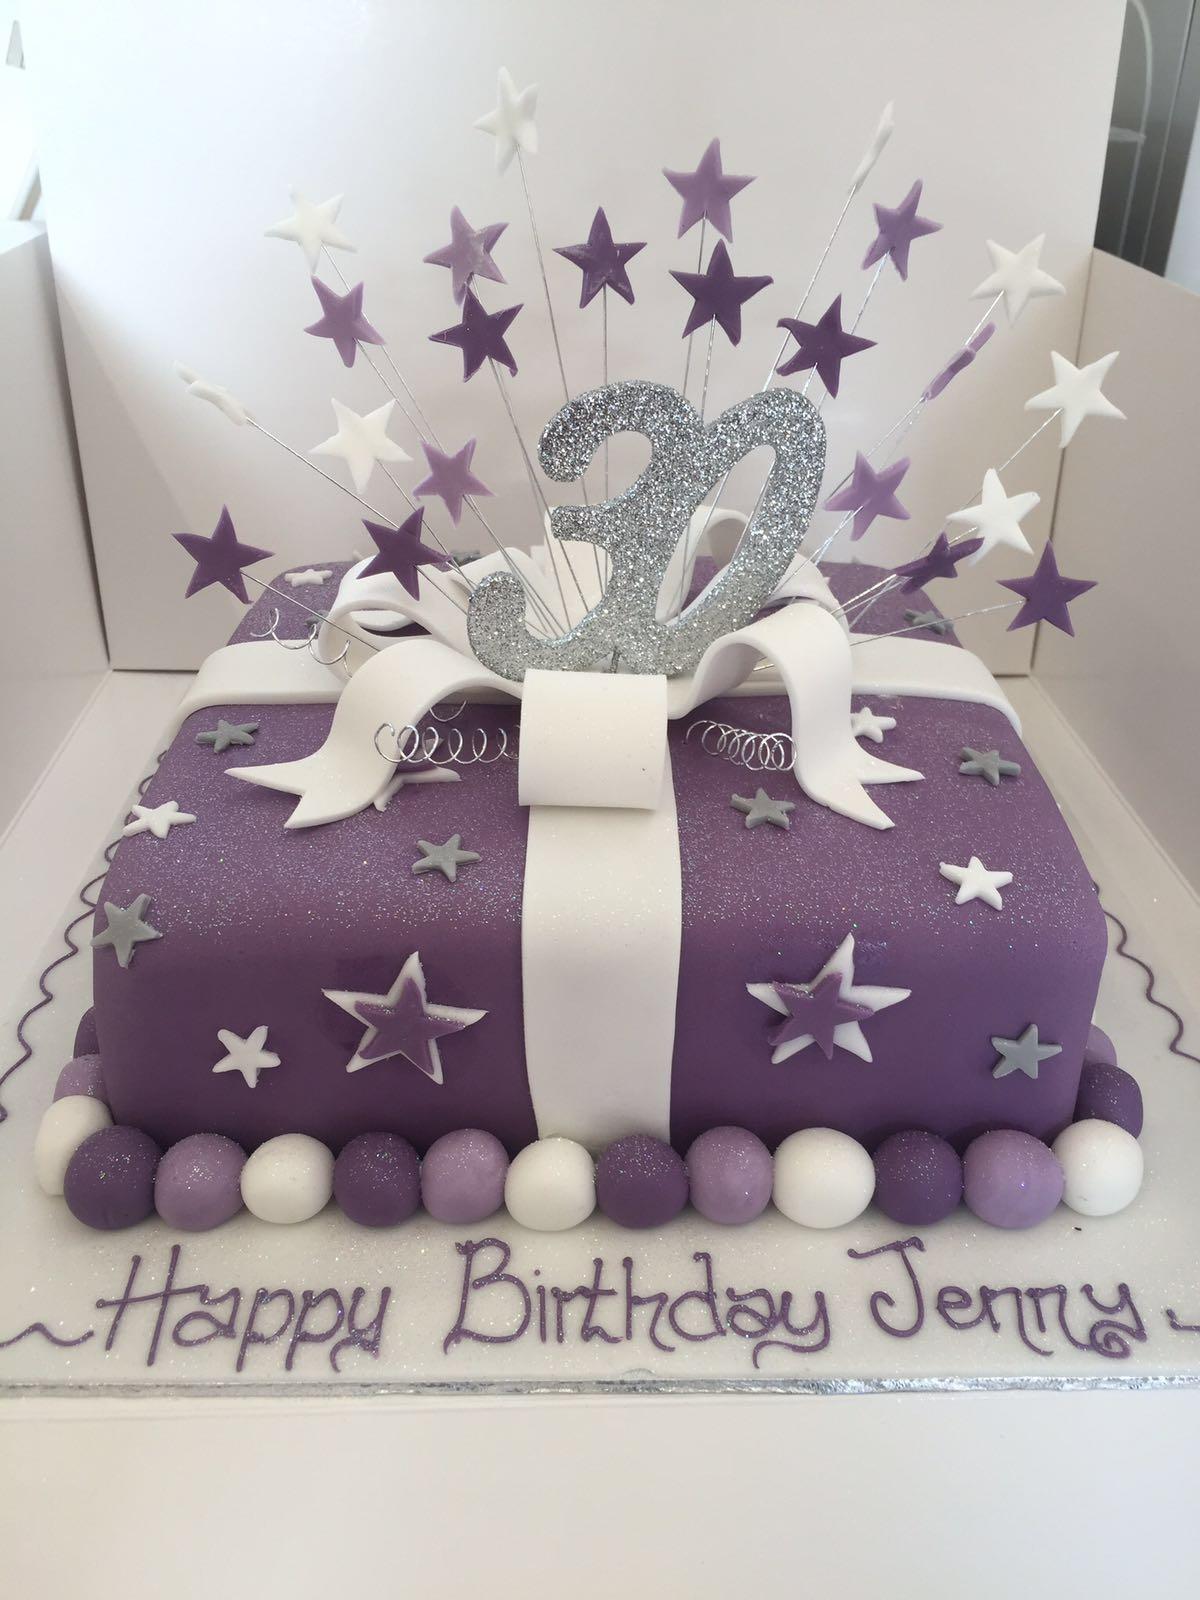 Super Purple Present And Stars Cake Peter Herd Funny Birthday Cards Online Chimdamsfinfo